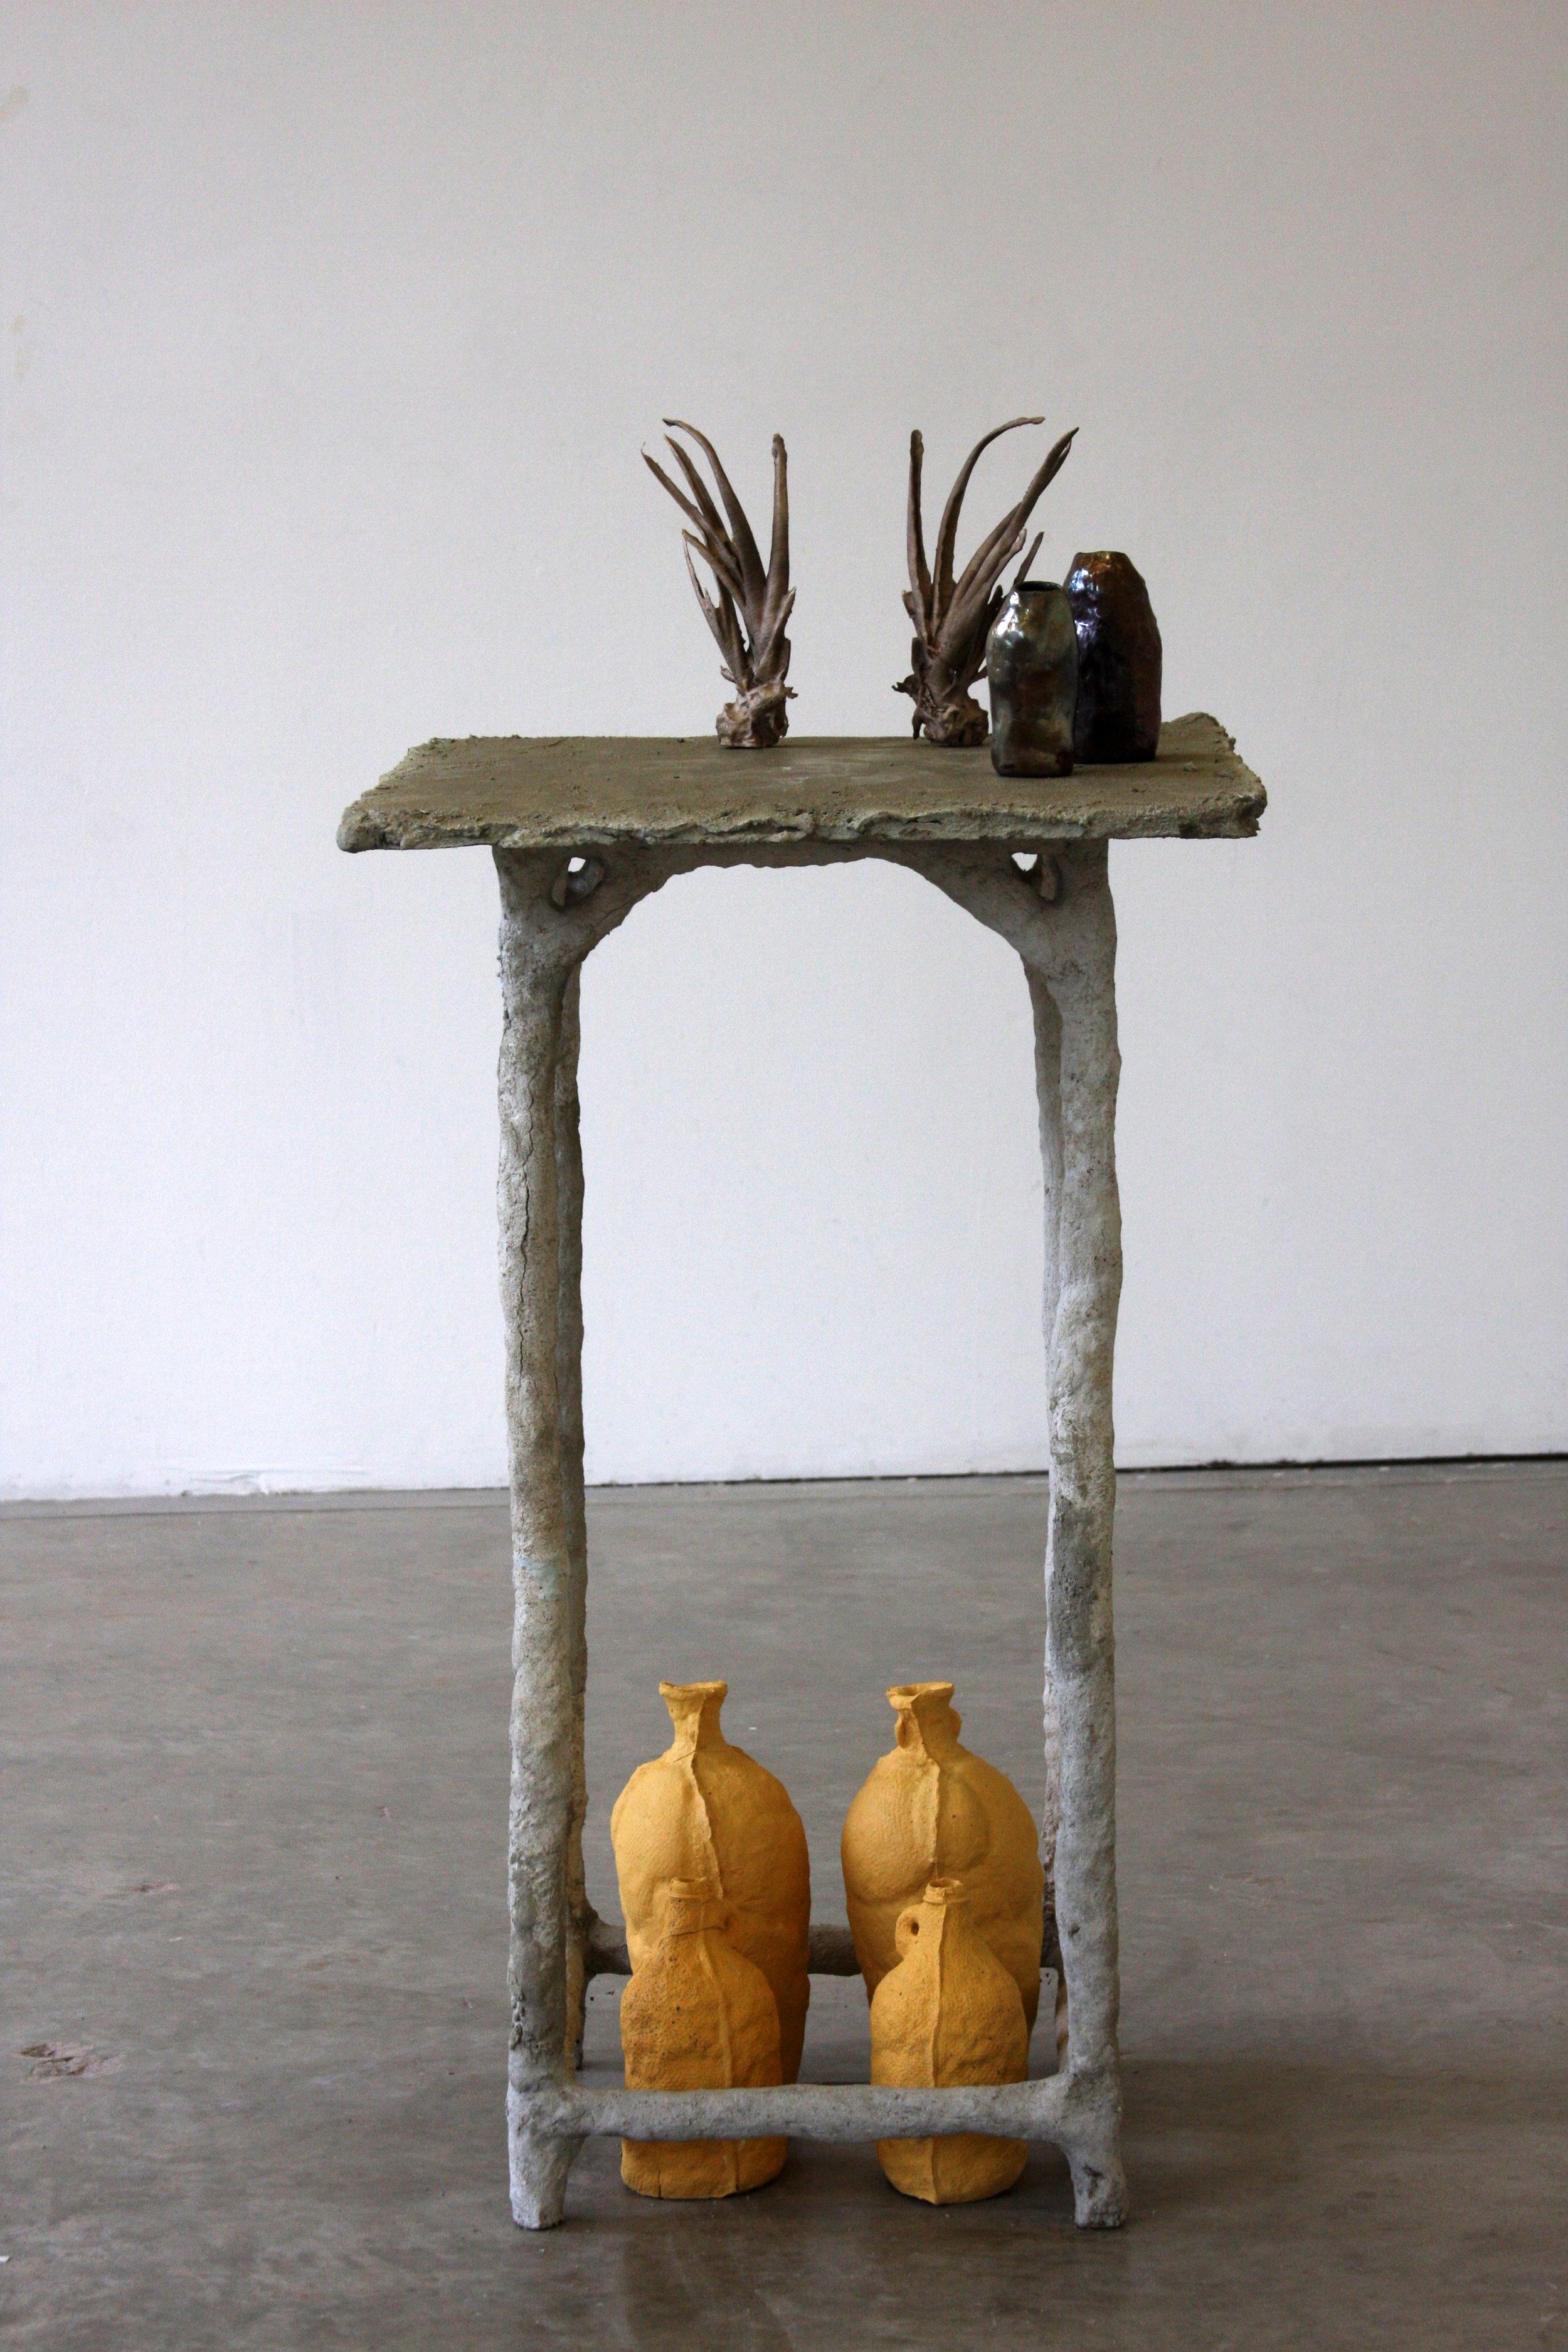 mortar table, slip-cast dyed porcelain vessels, bronze cast aloe vera (cast from PLA prints)